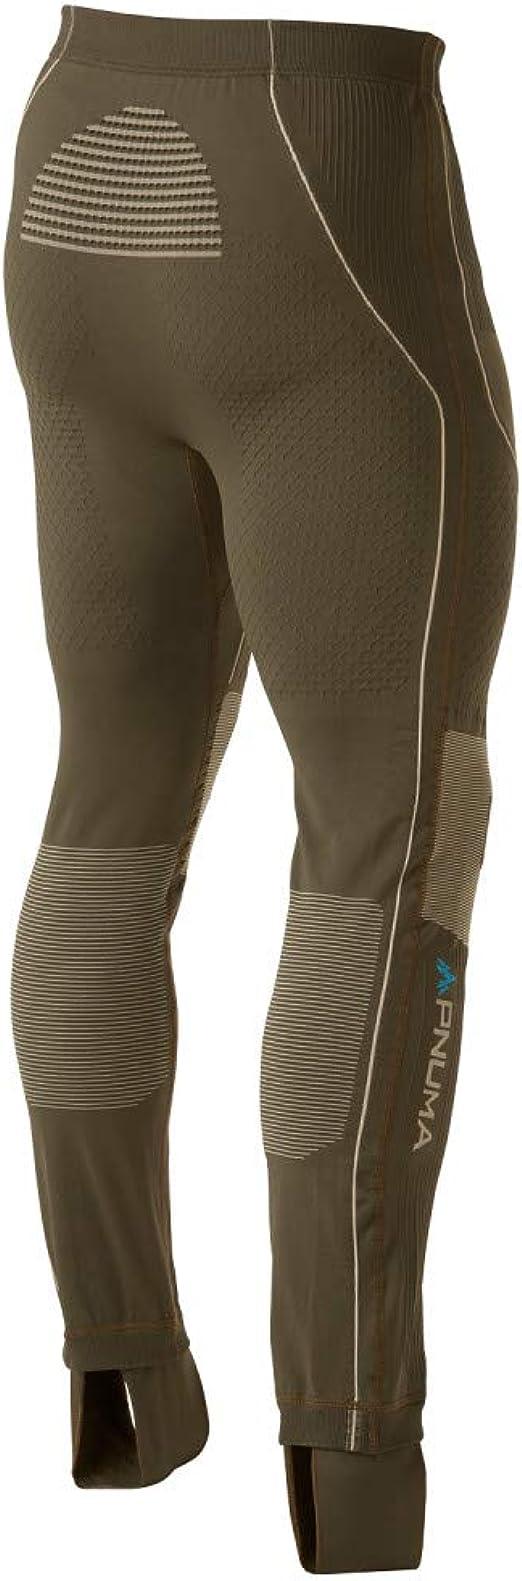 Pnuma IconX Base Layer Shirt Men/'s Thermal Long Sleeve Hunting/ Undershirt